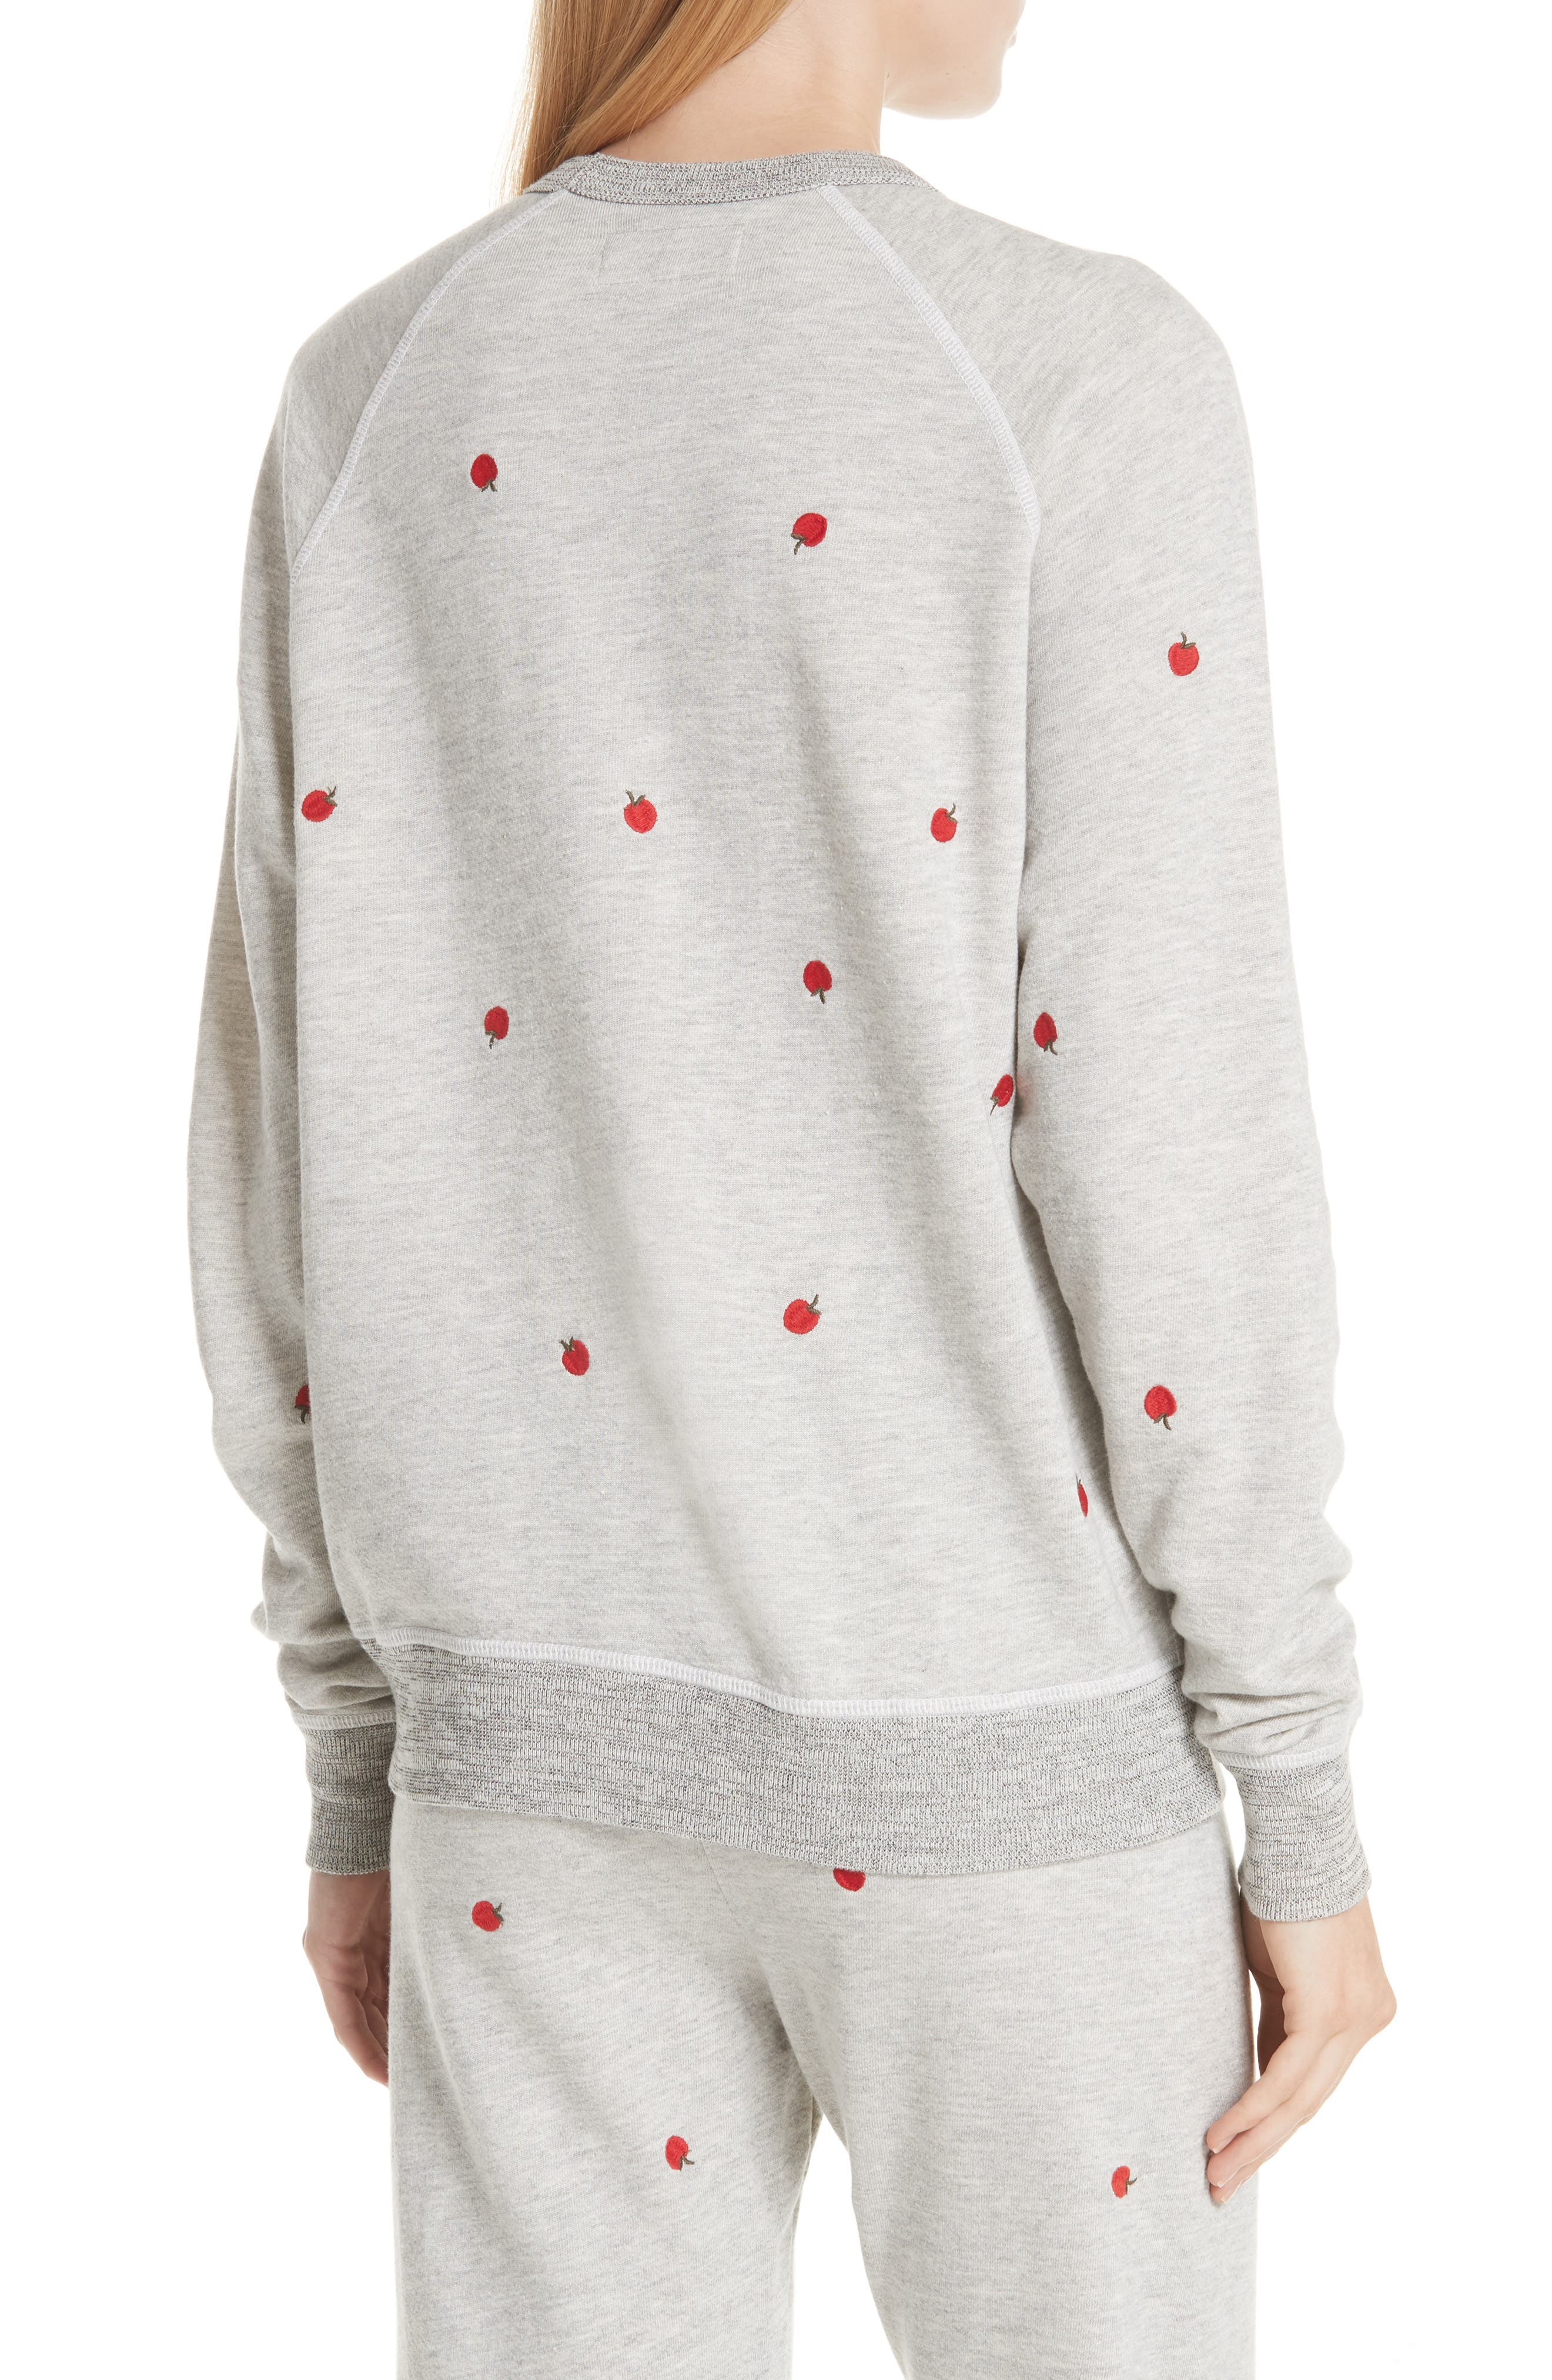 College Sweatshirt,                             Alternate thumbnail 2, color,                             Light Heather Grey/ Red Apples